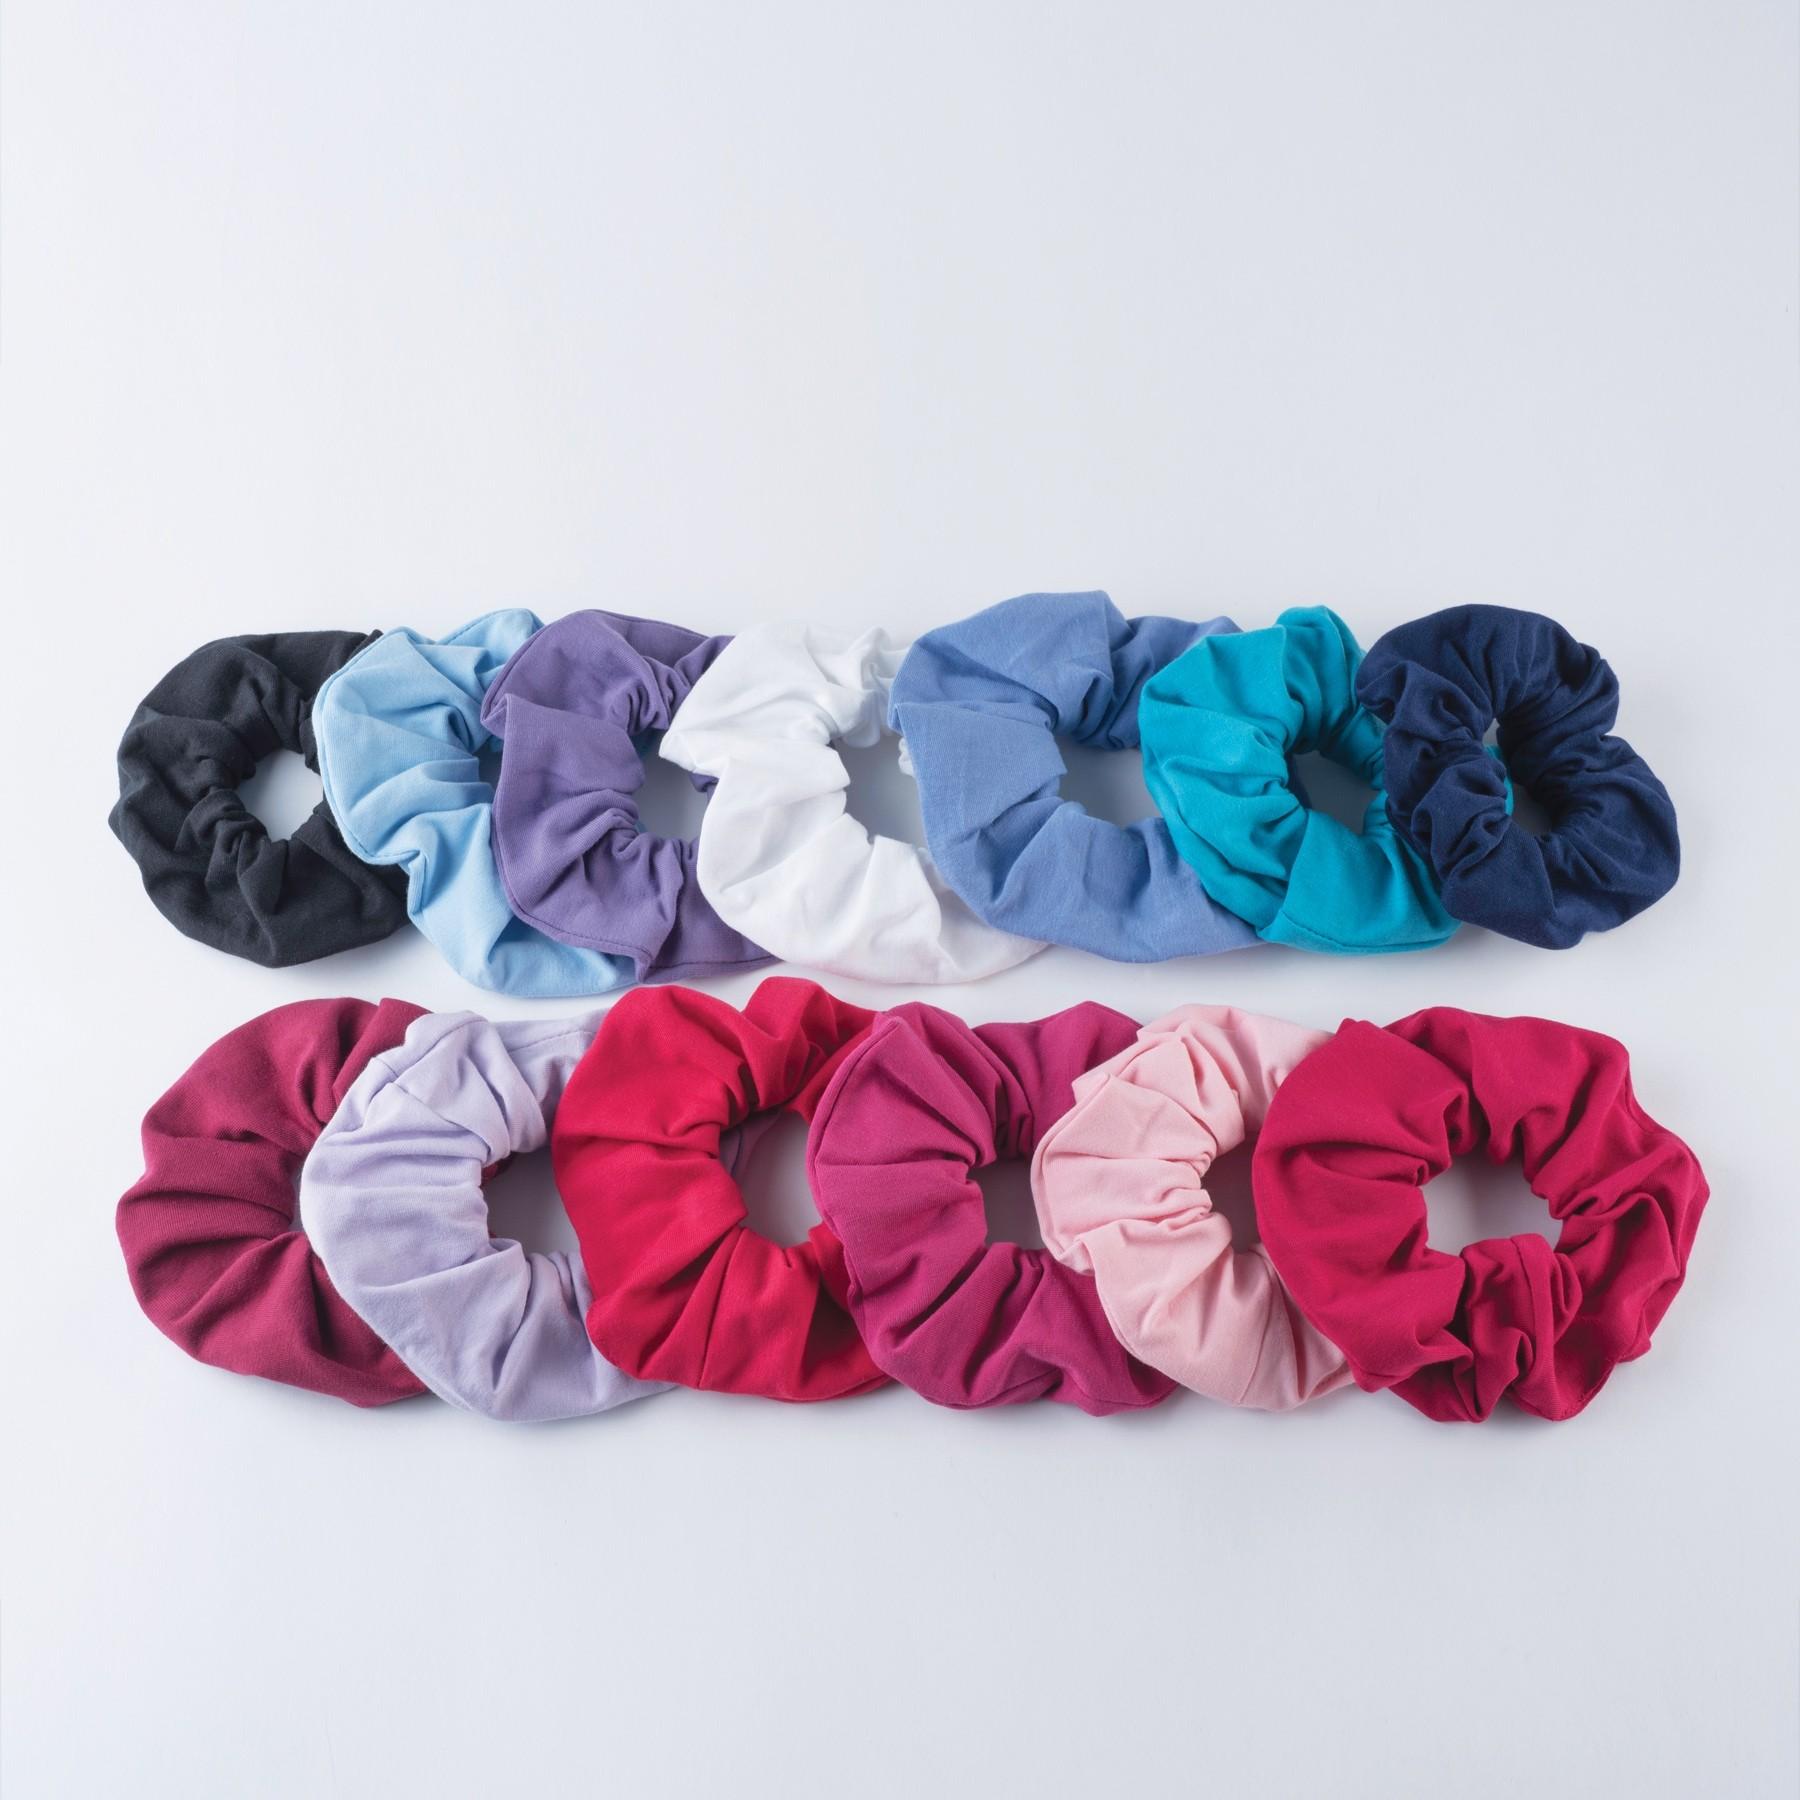 1st Position Single Scrunchie (Cotton/Elastane) Mulberry